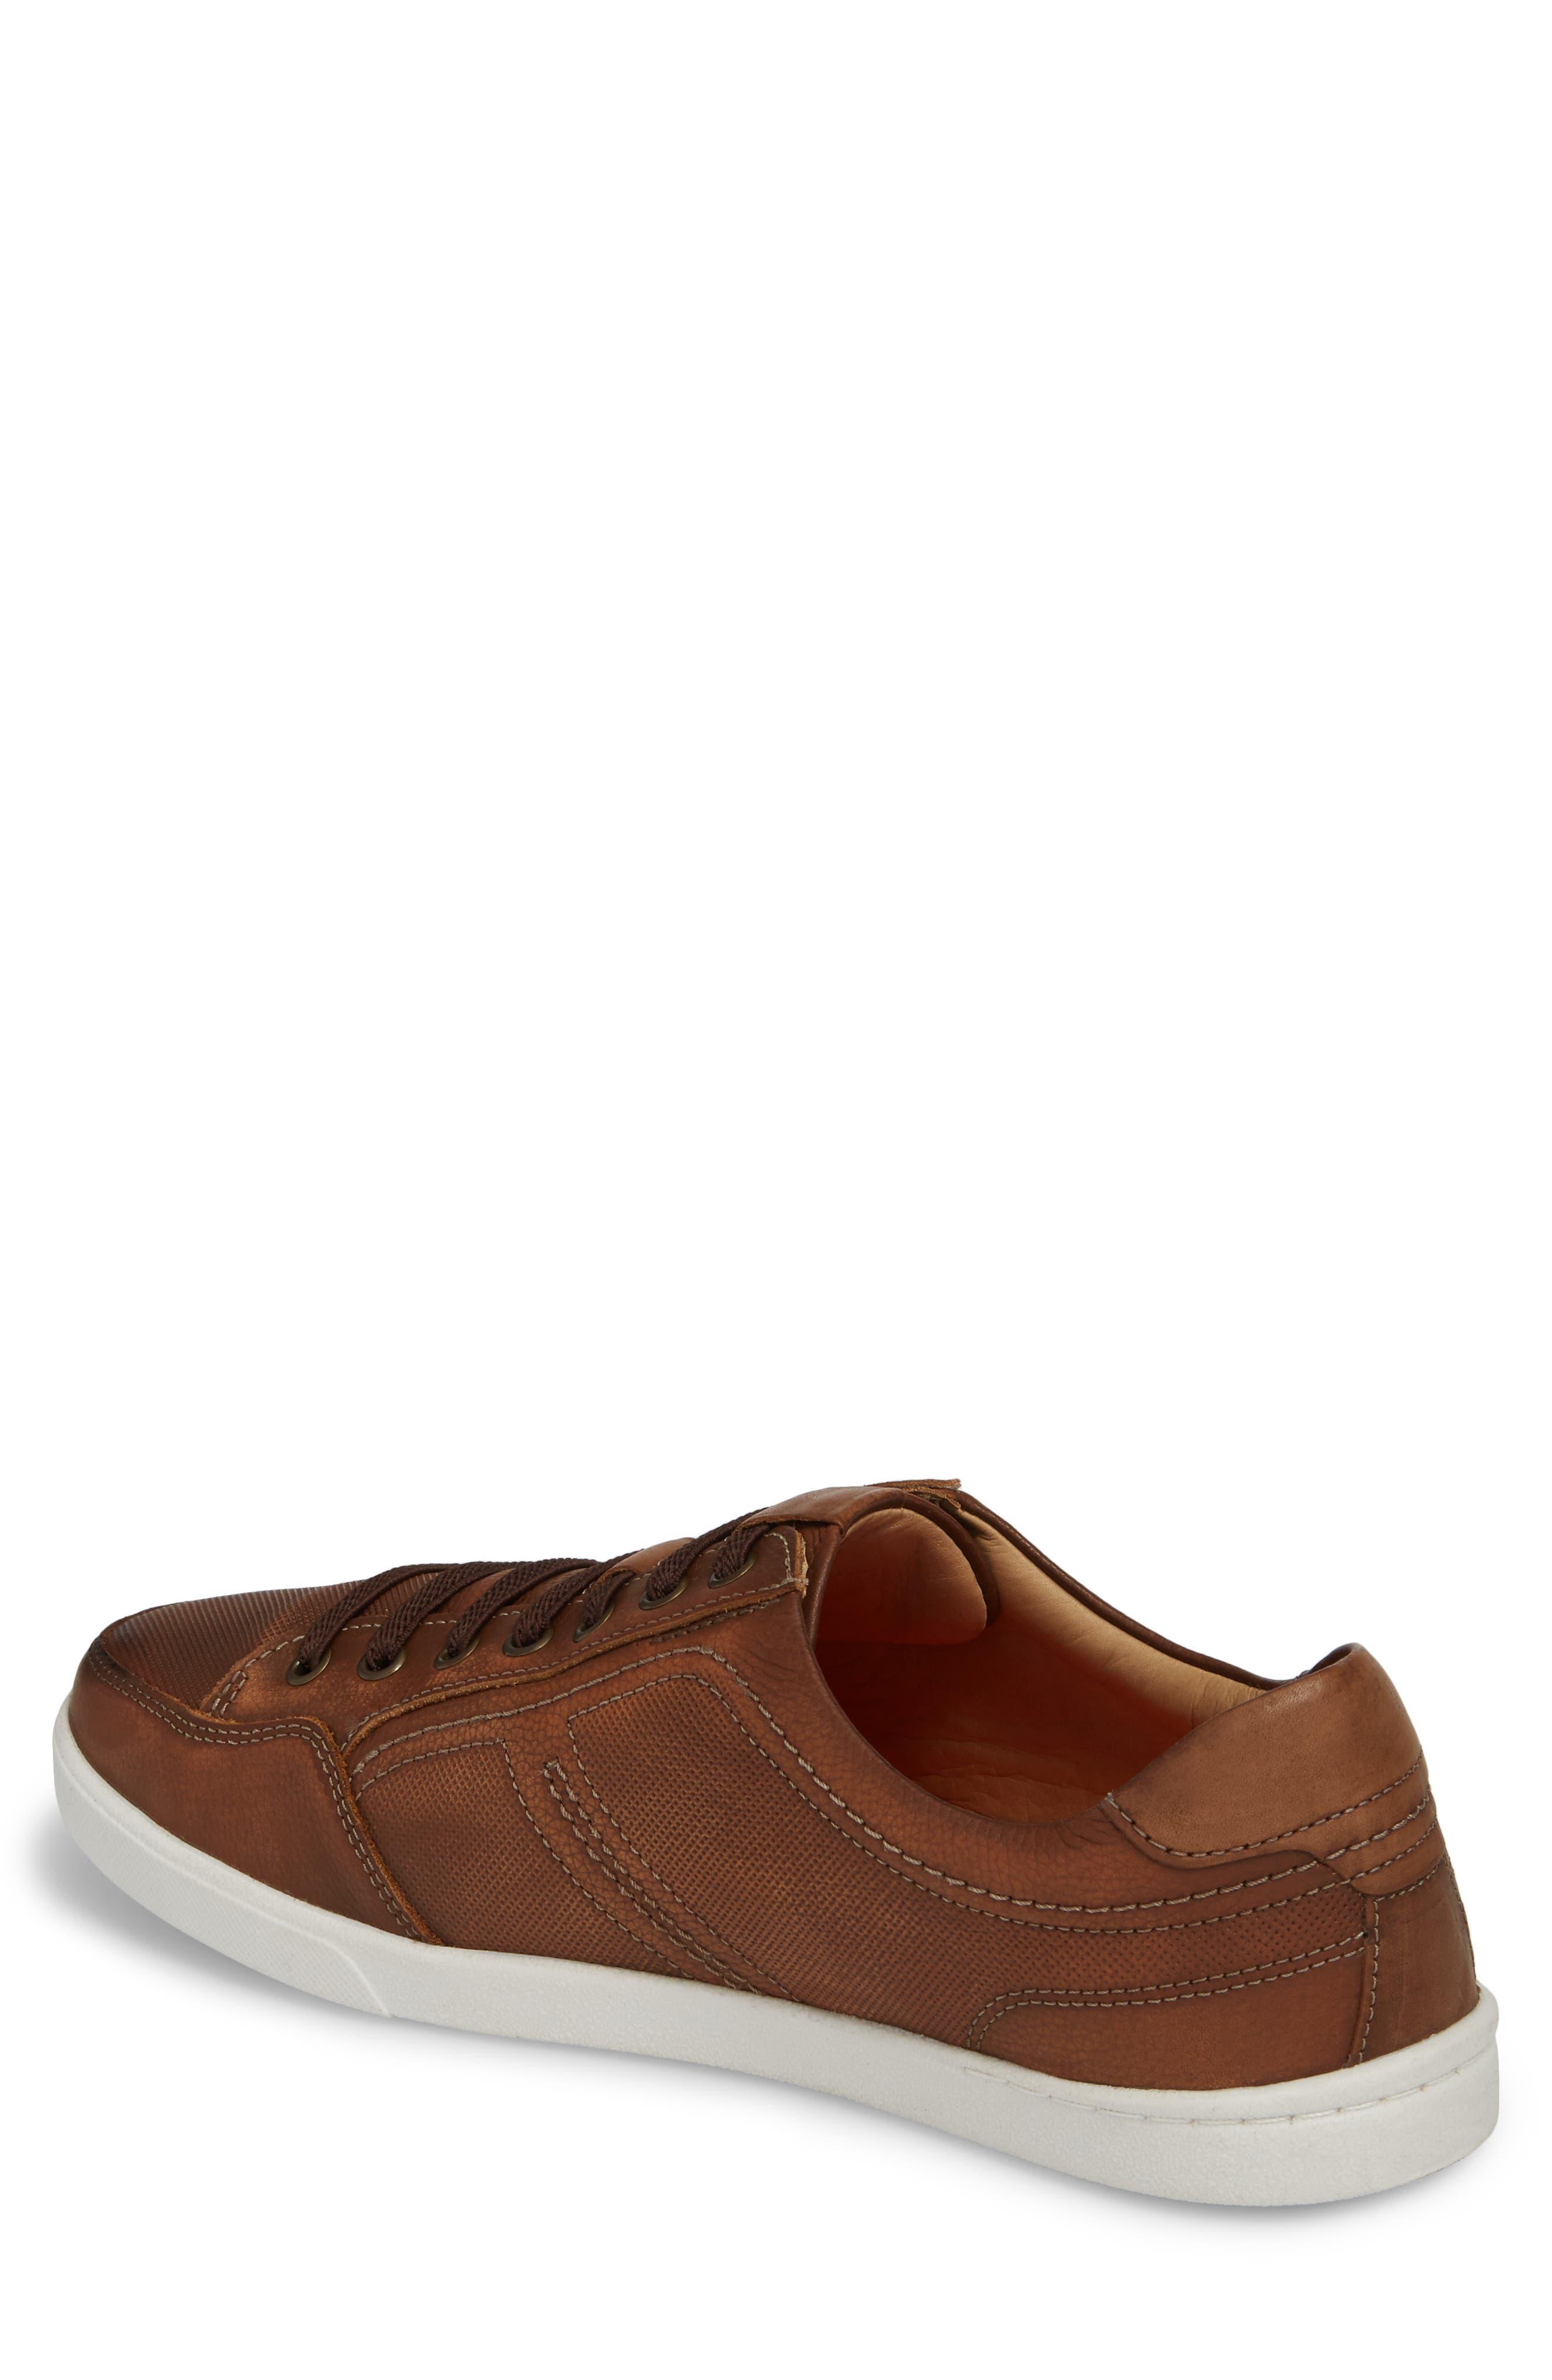 Quinton Textured Low Top Sneaker,                             Alternate thumbnail 2, color,                             Tan Leather